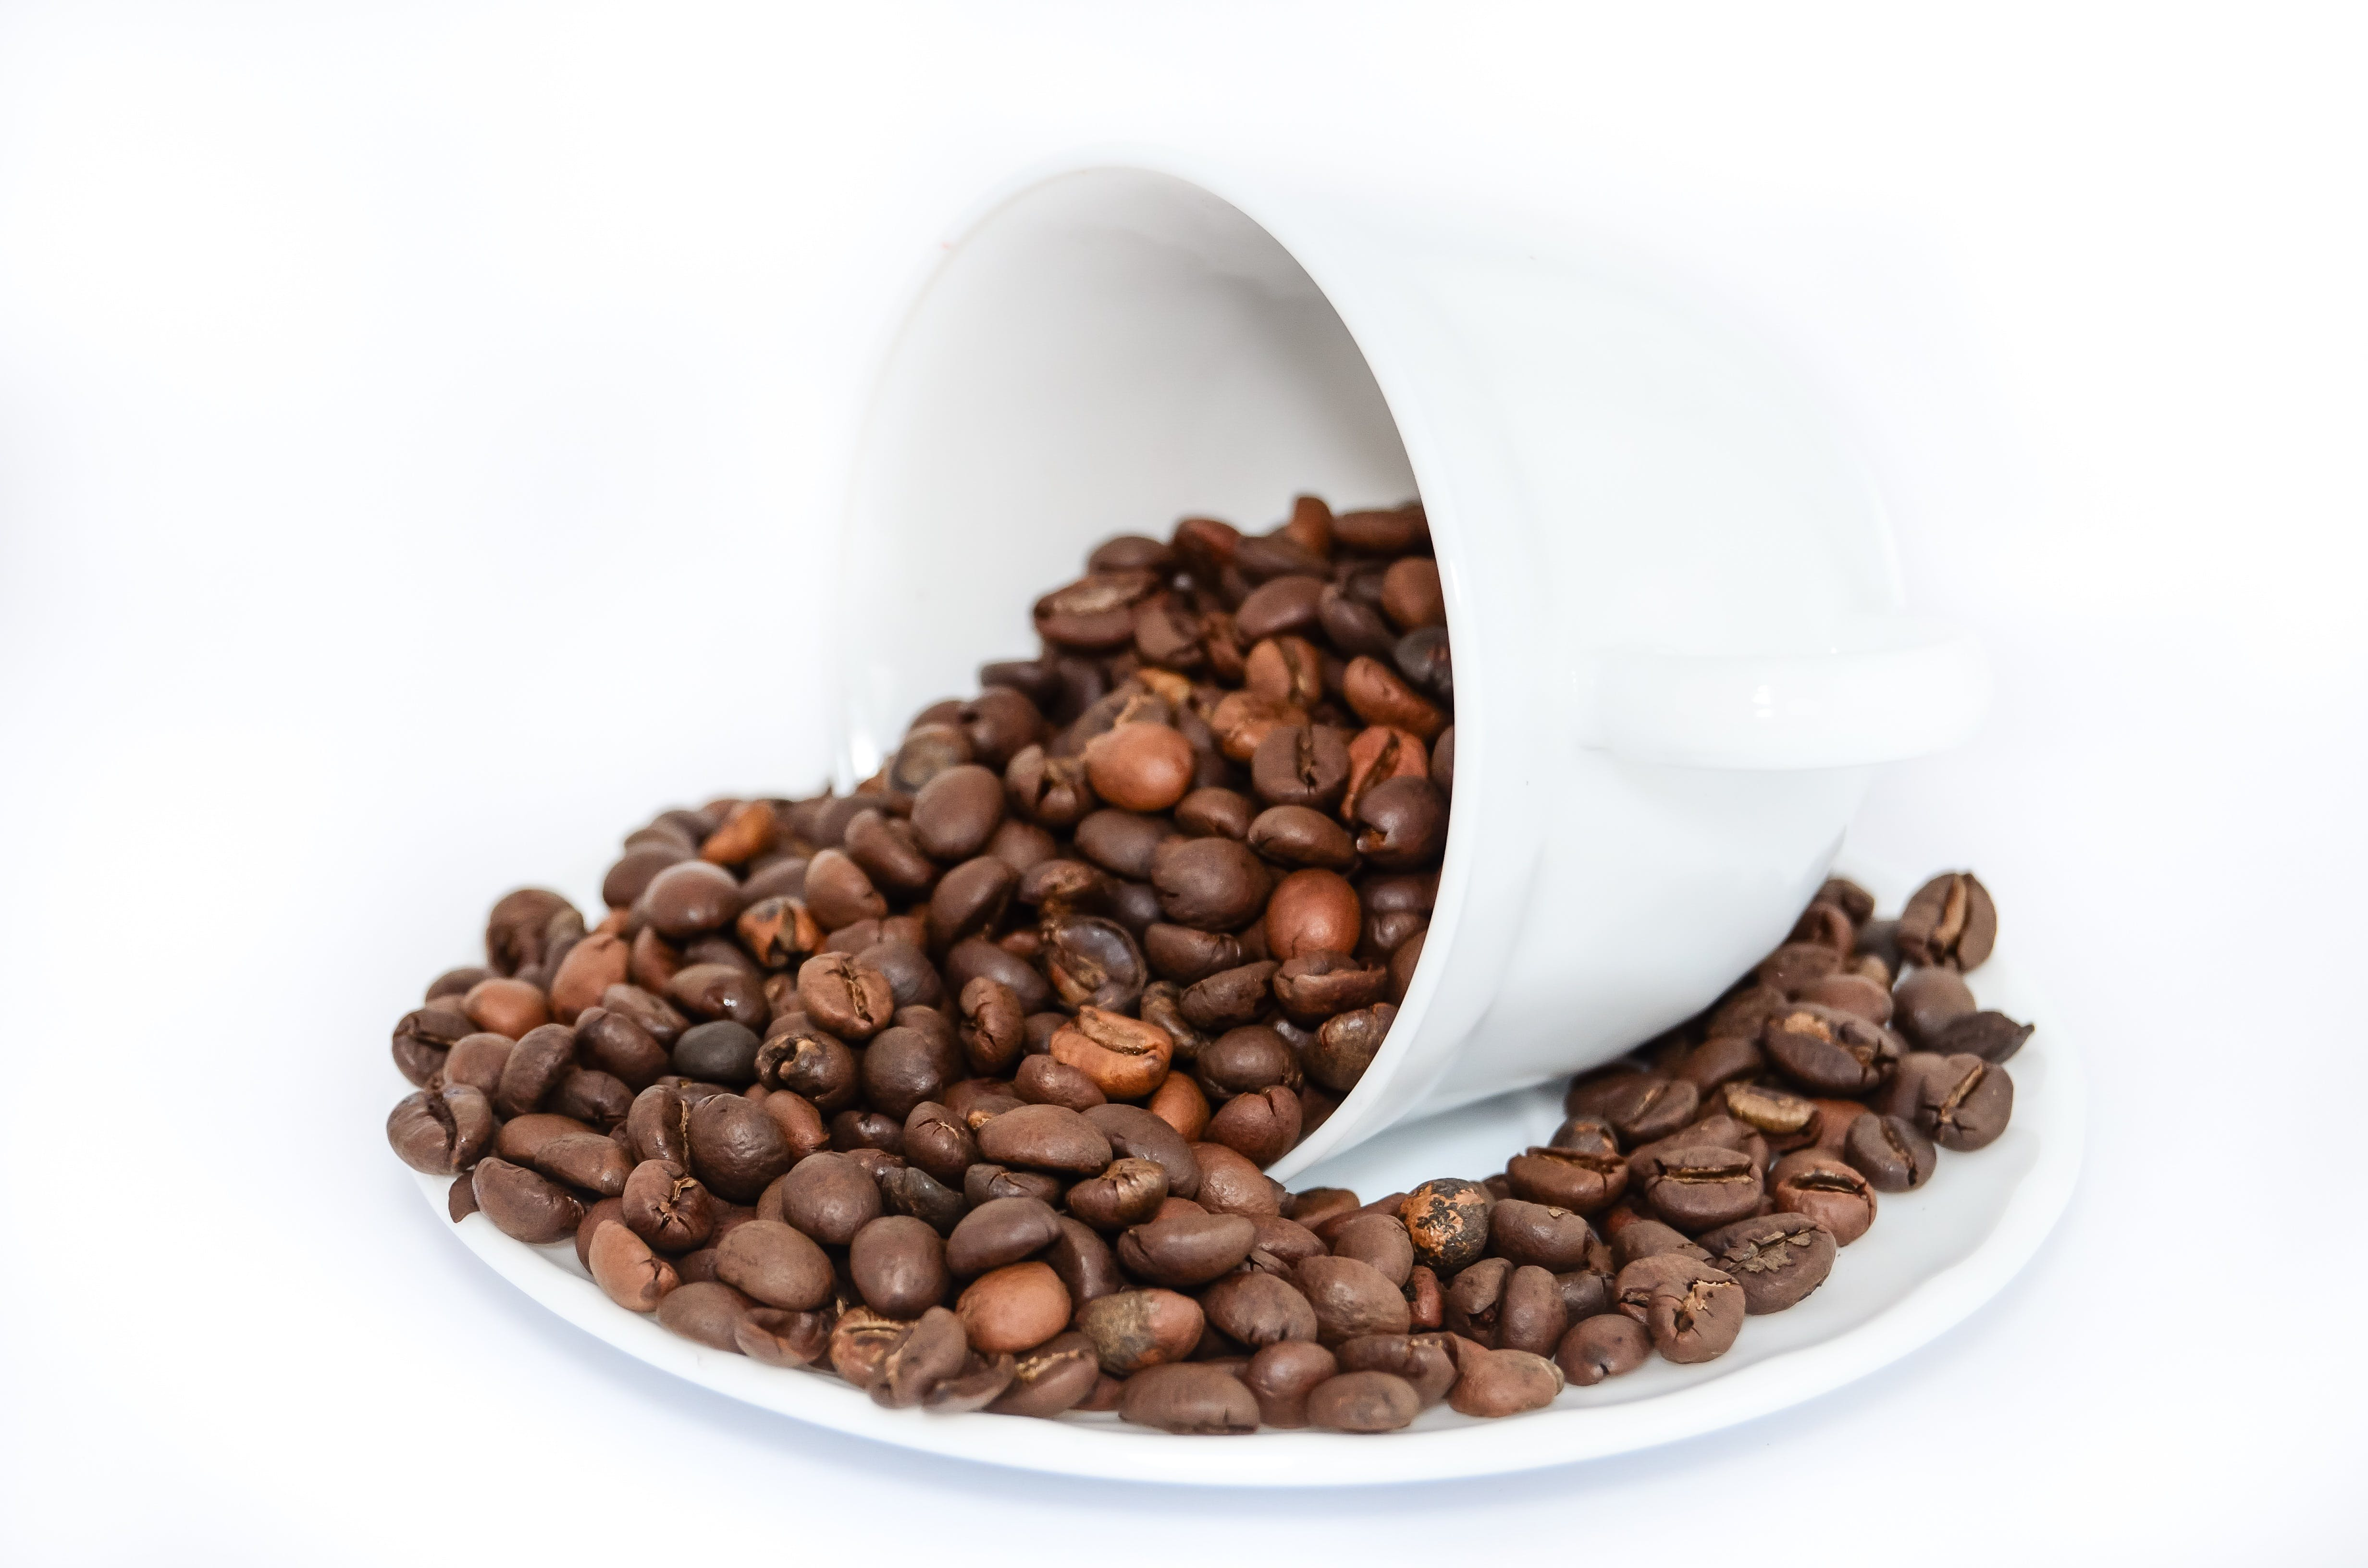 Gratis lagerfoto af kaffe, kaffebønner, keramik, koffein